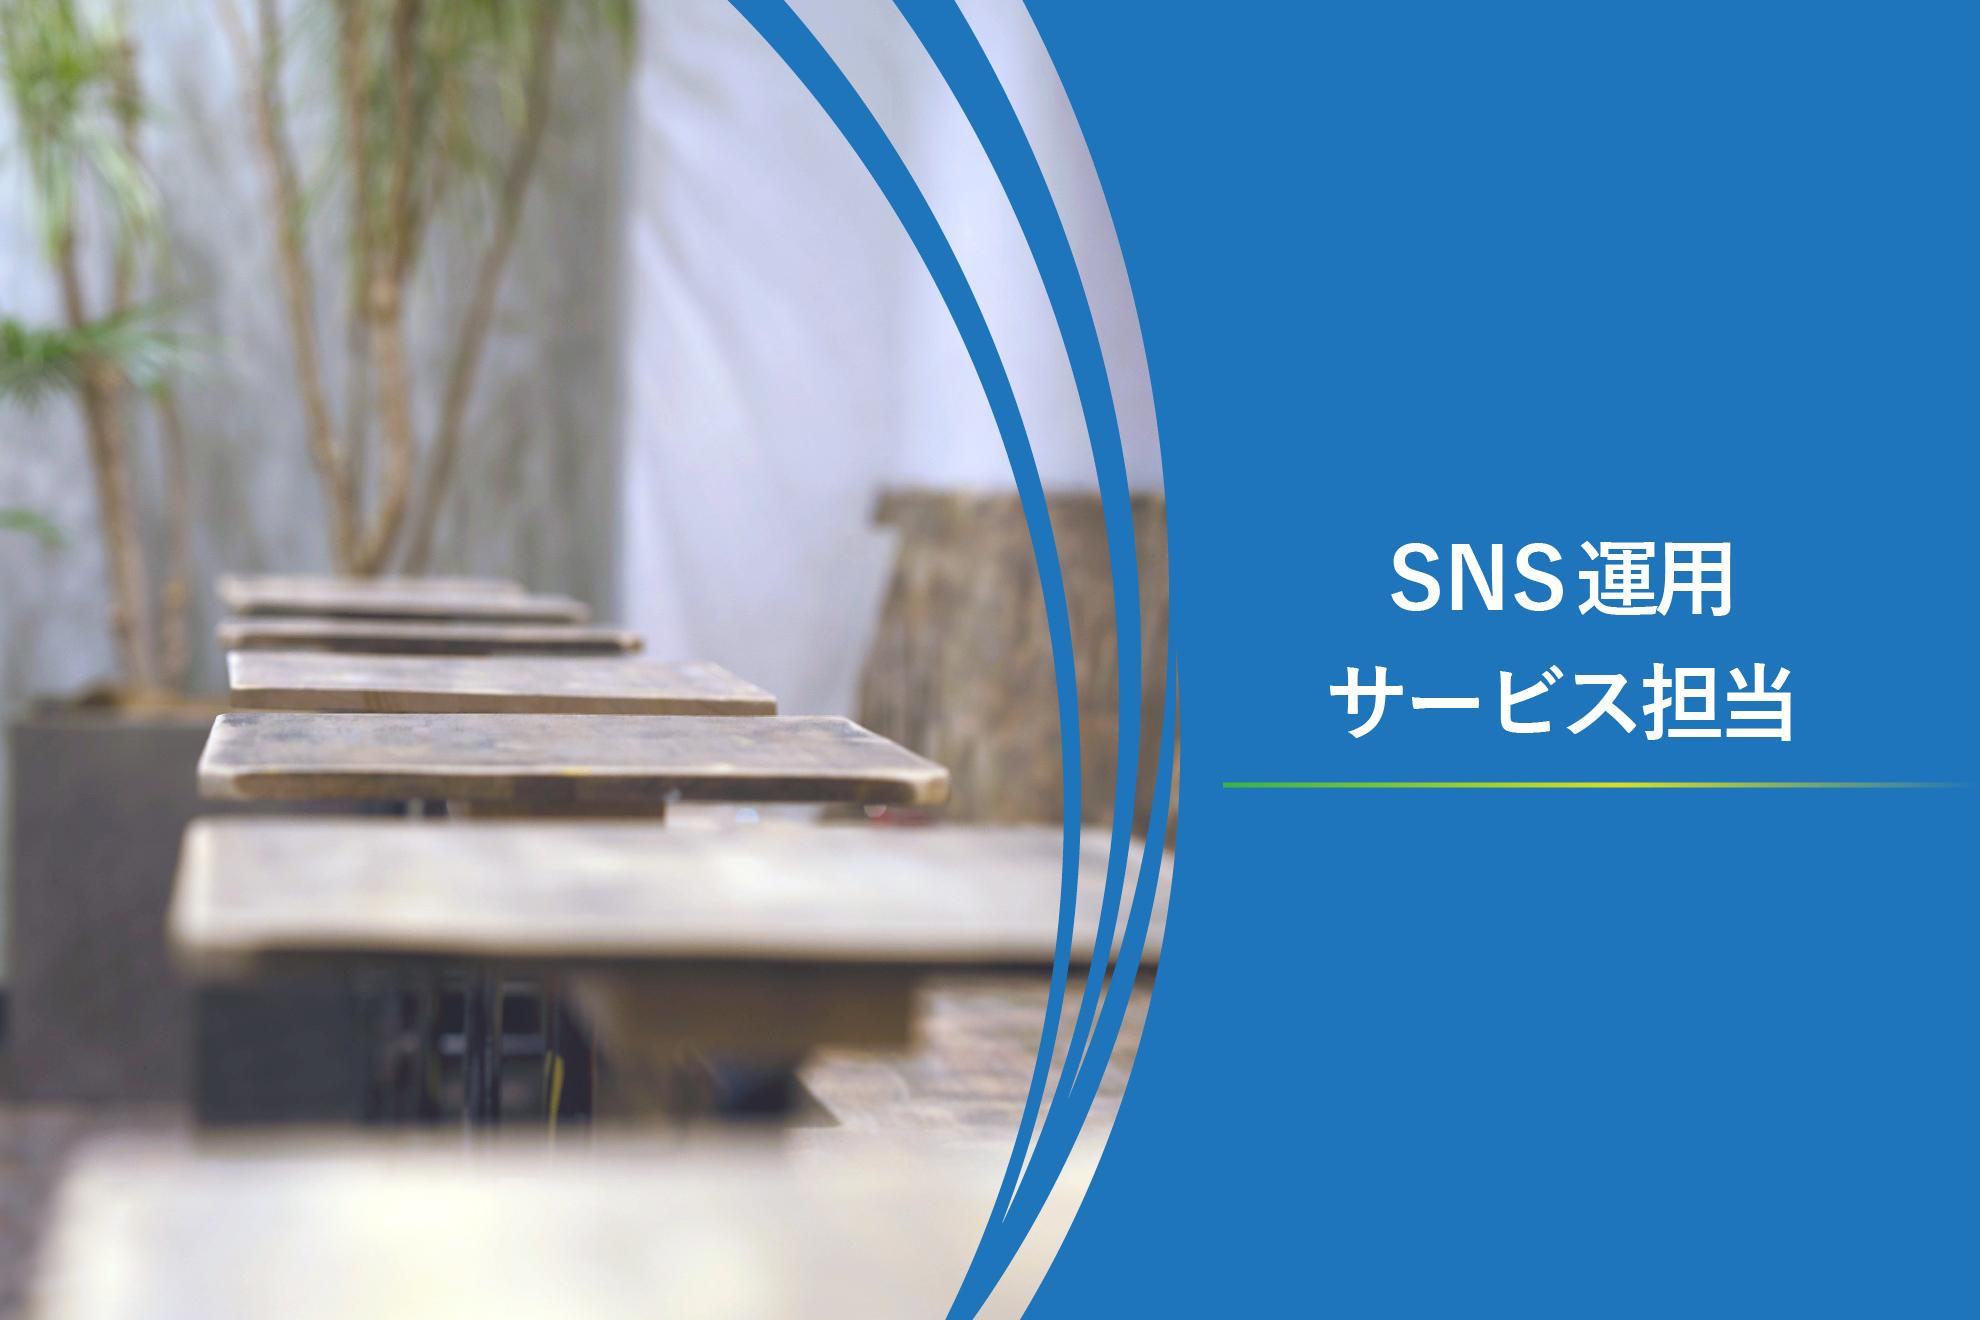 07 SNS運用サービス担当_正社員